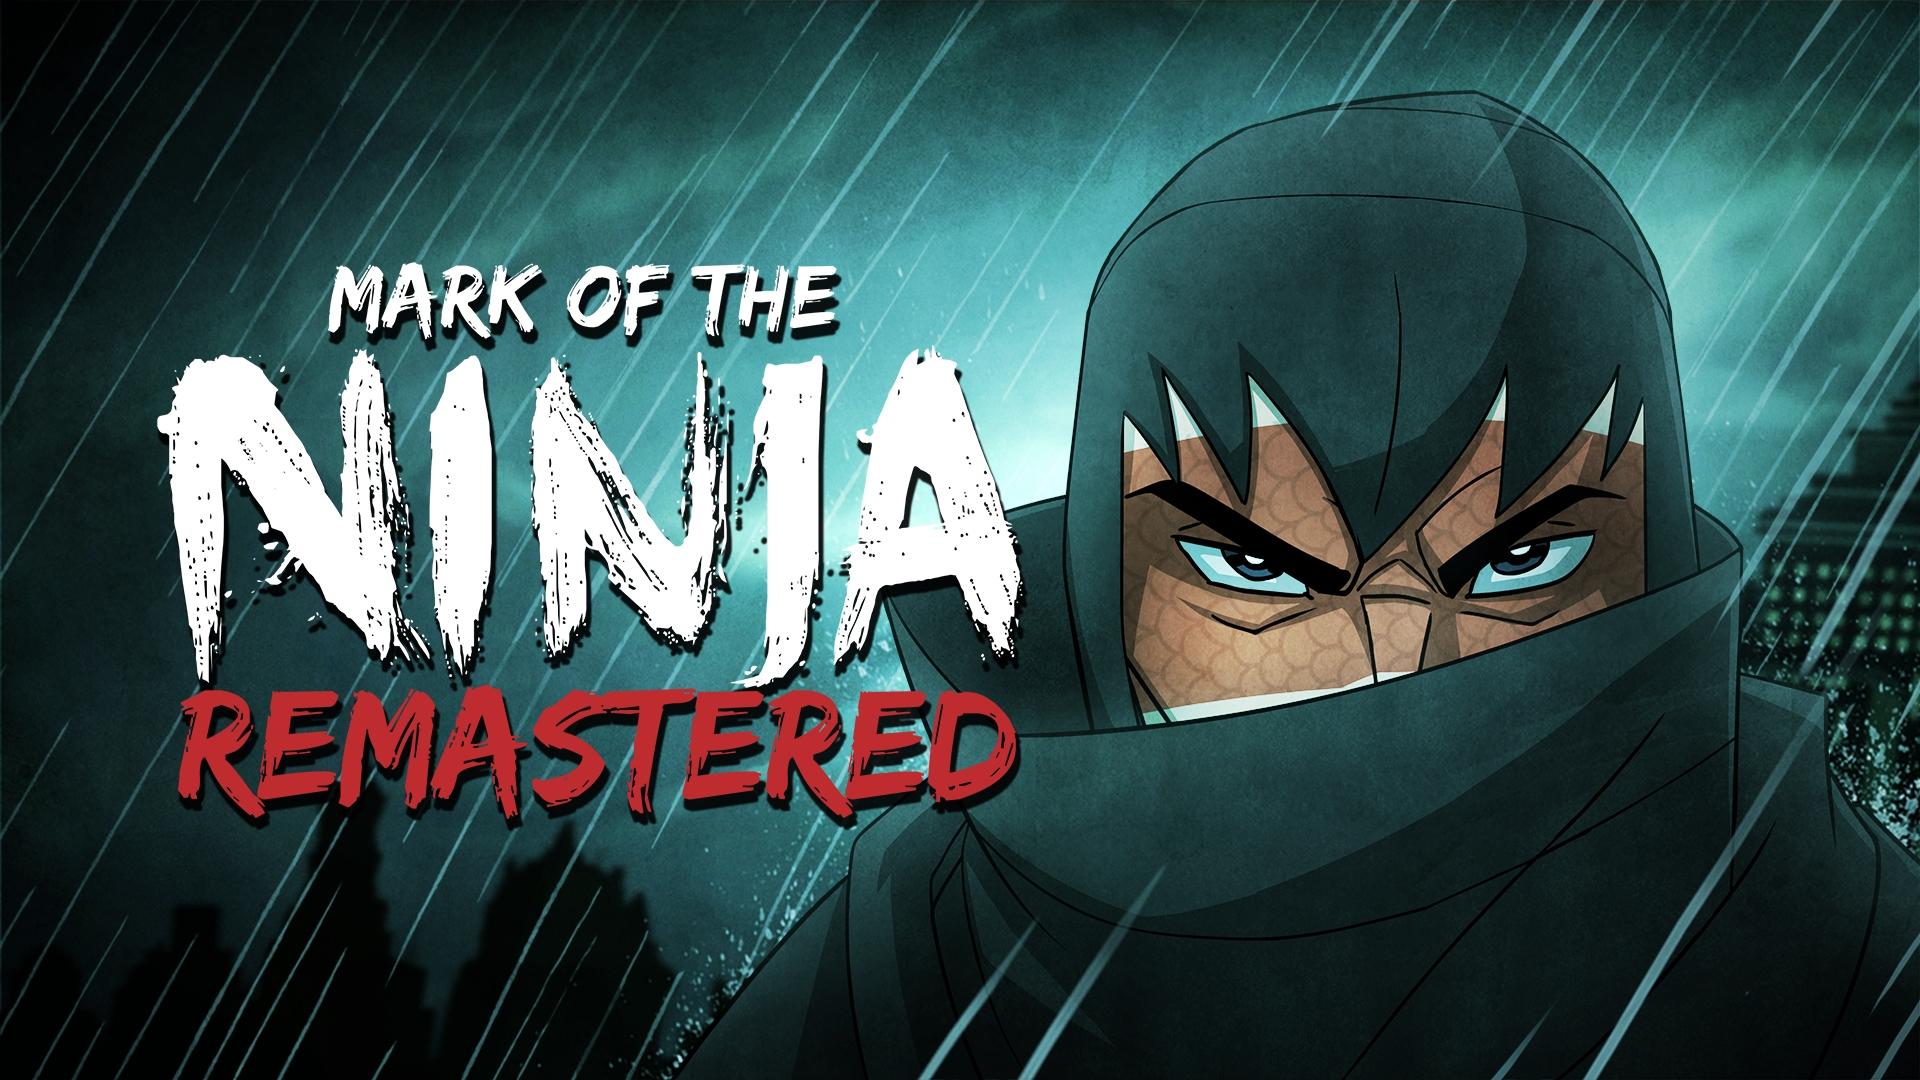 Mark of the Ninja: Remastered (Nintendo Switch Digital Download) - $4.99 @ Nintendo eShop